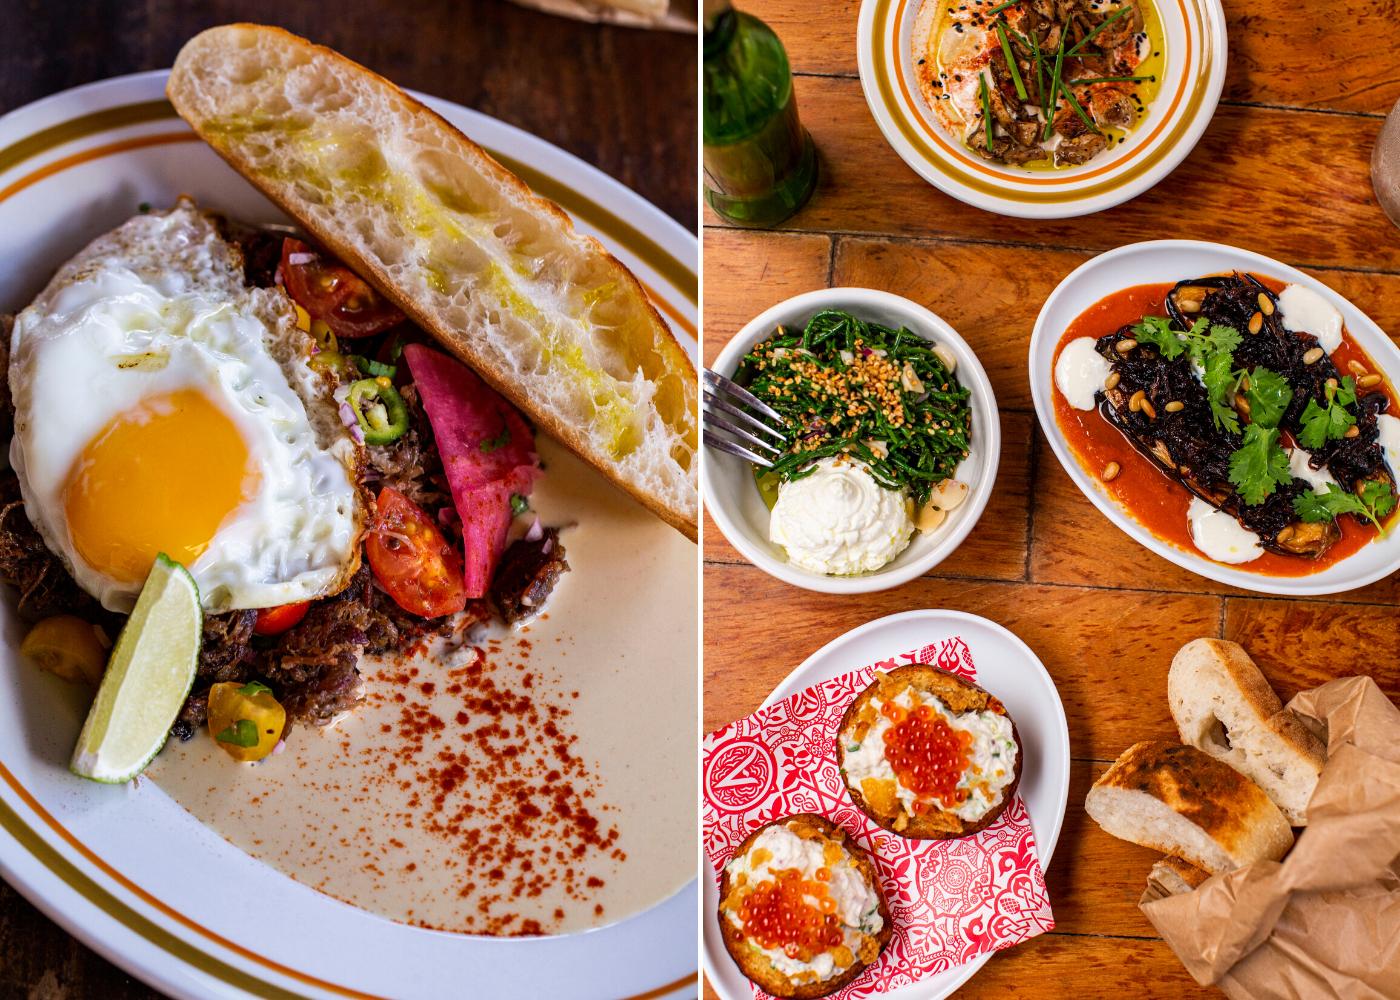 Communal dining in Singapore: Artichoke